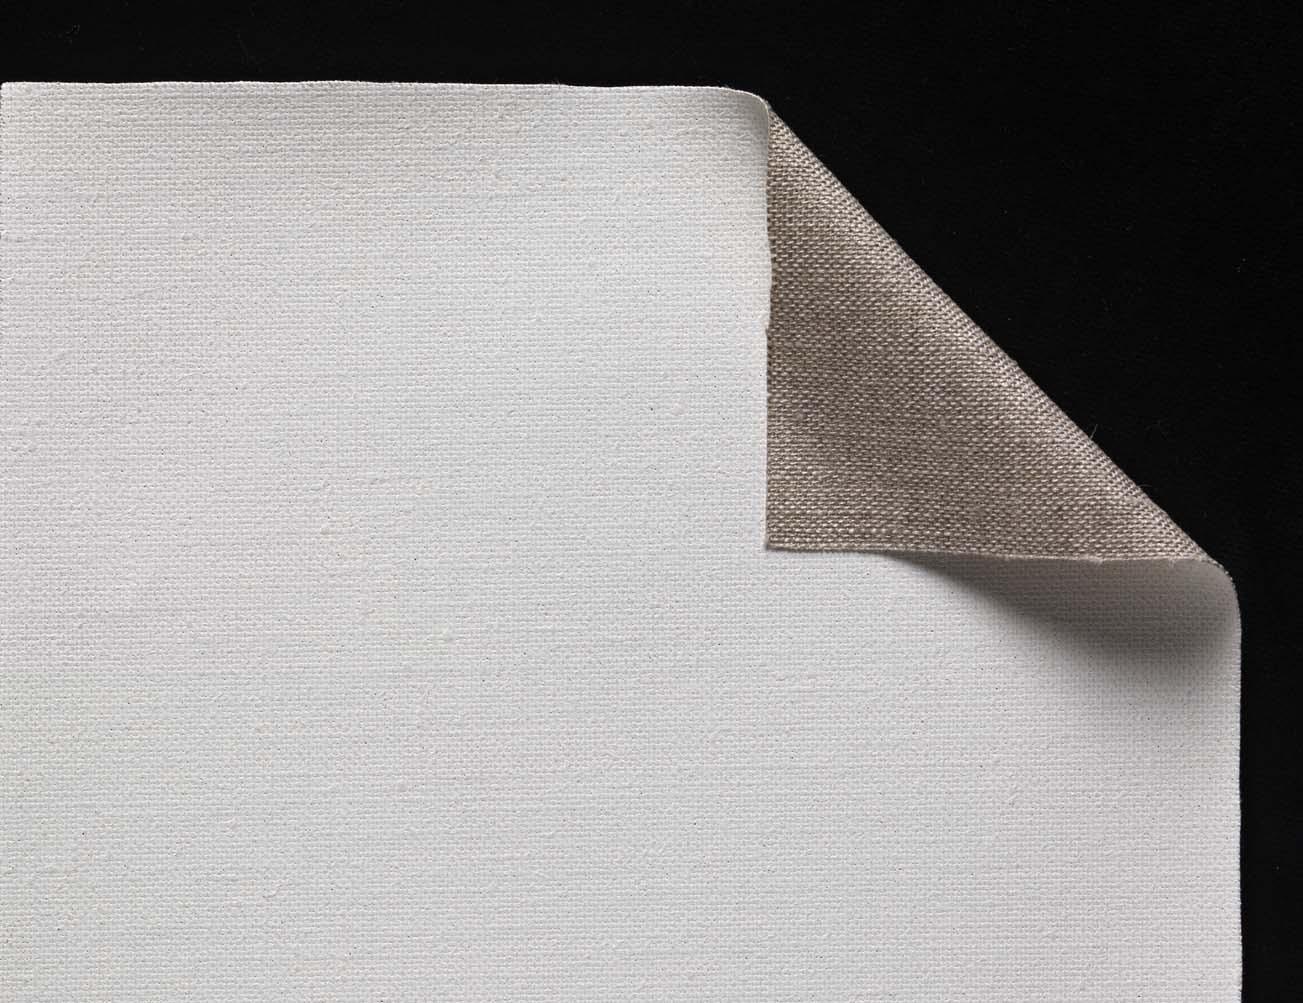 canvas 209 2 10 m canvas claessens artists 39 canvas. Black Bedroom Furniture Sets. Home Design Ideas